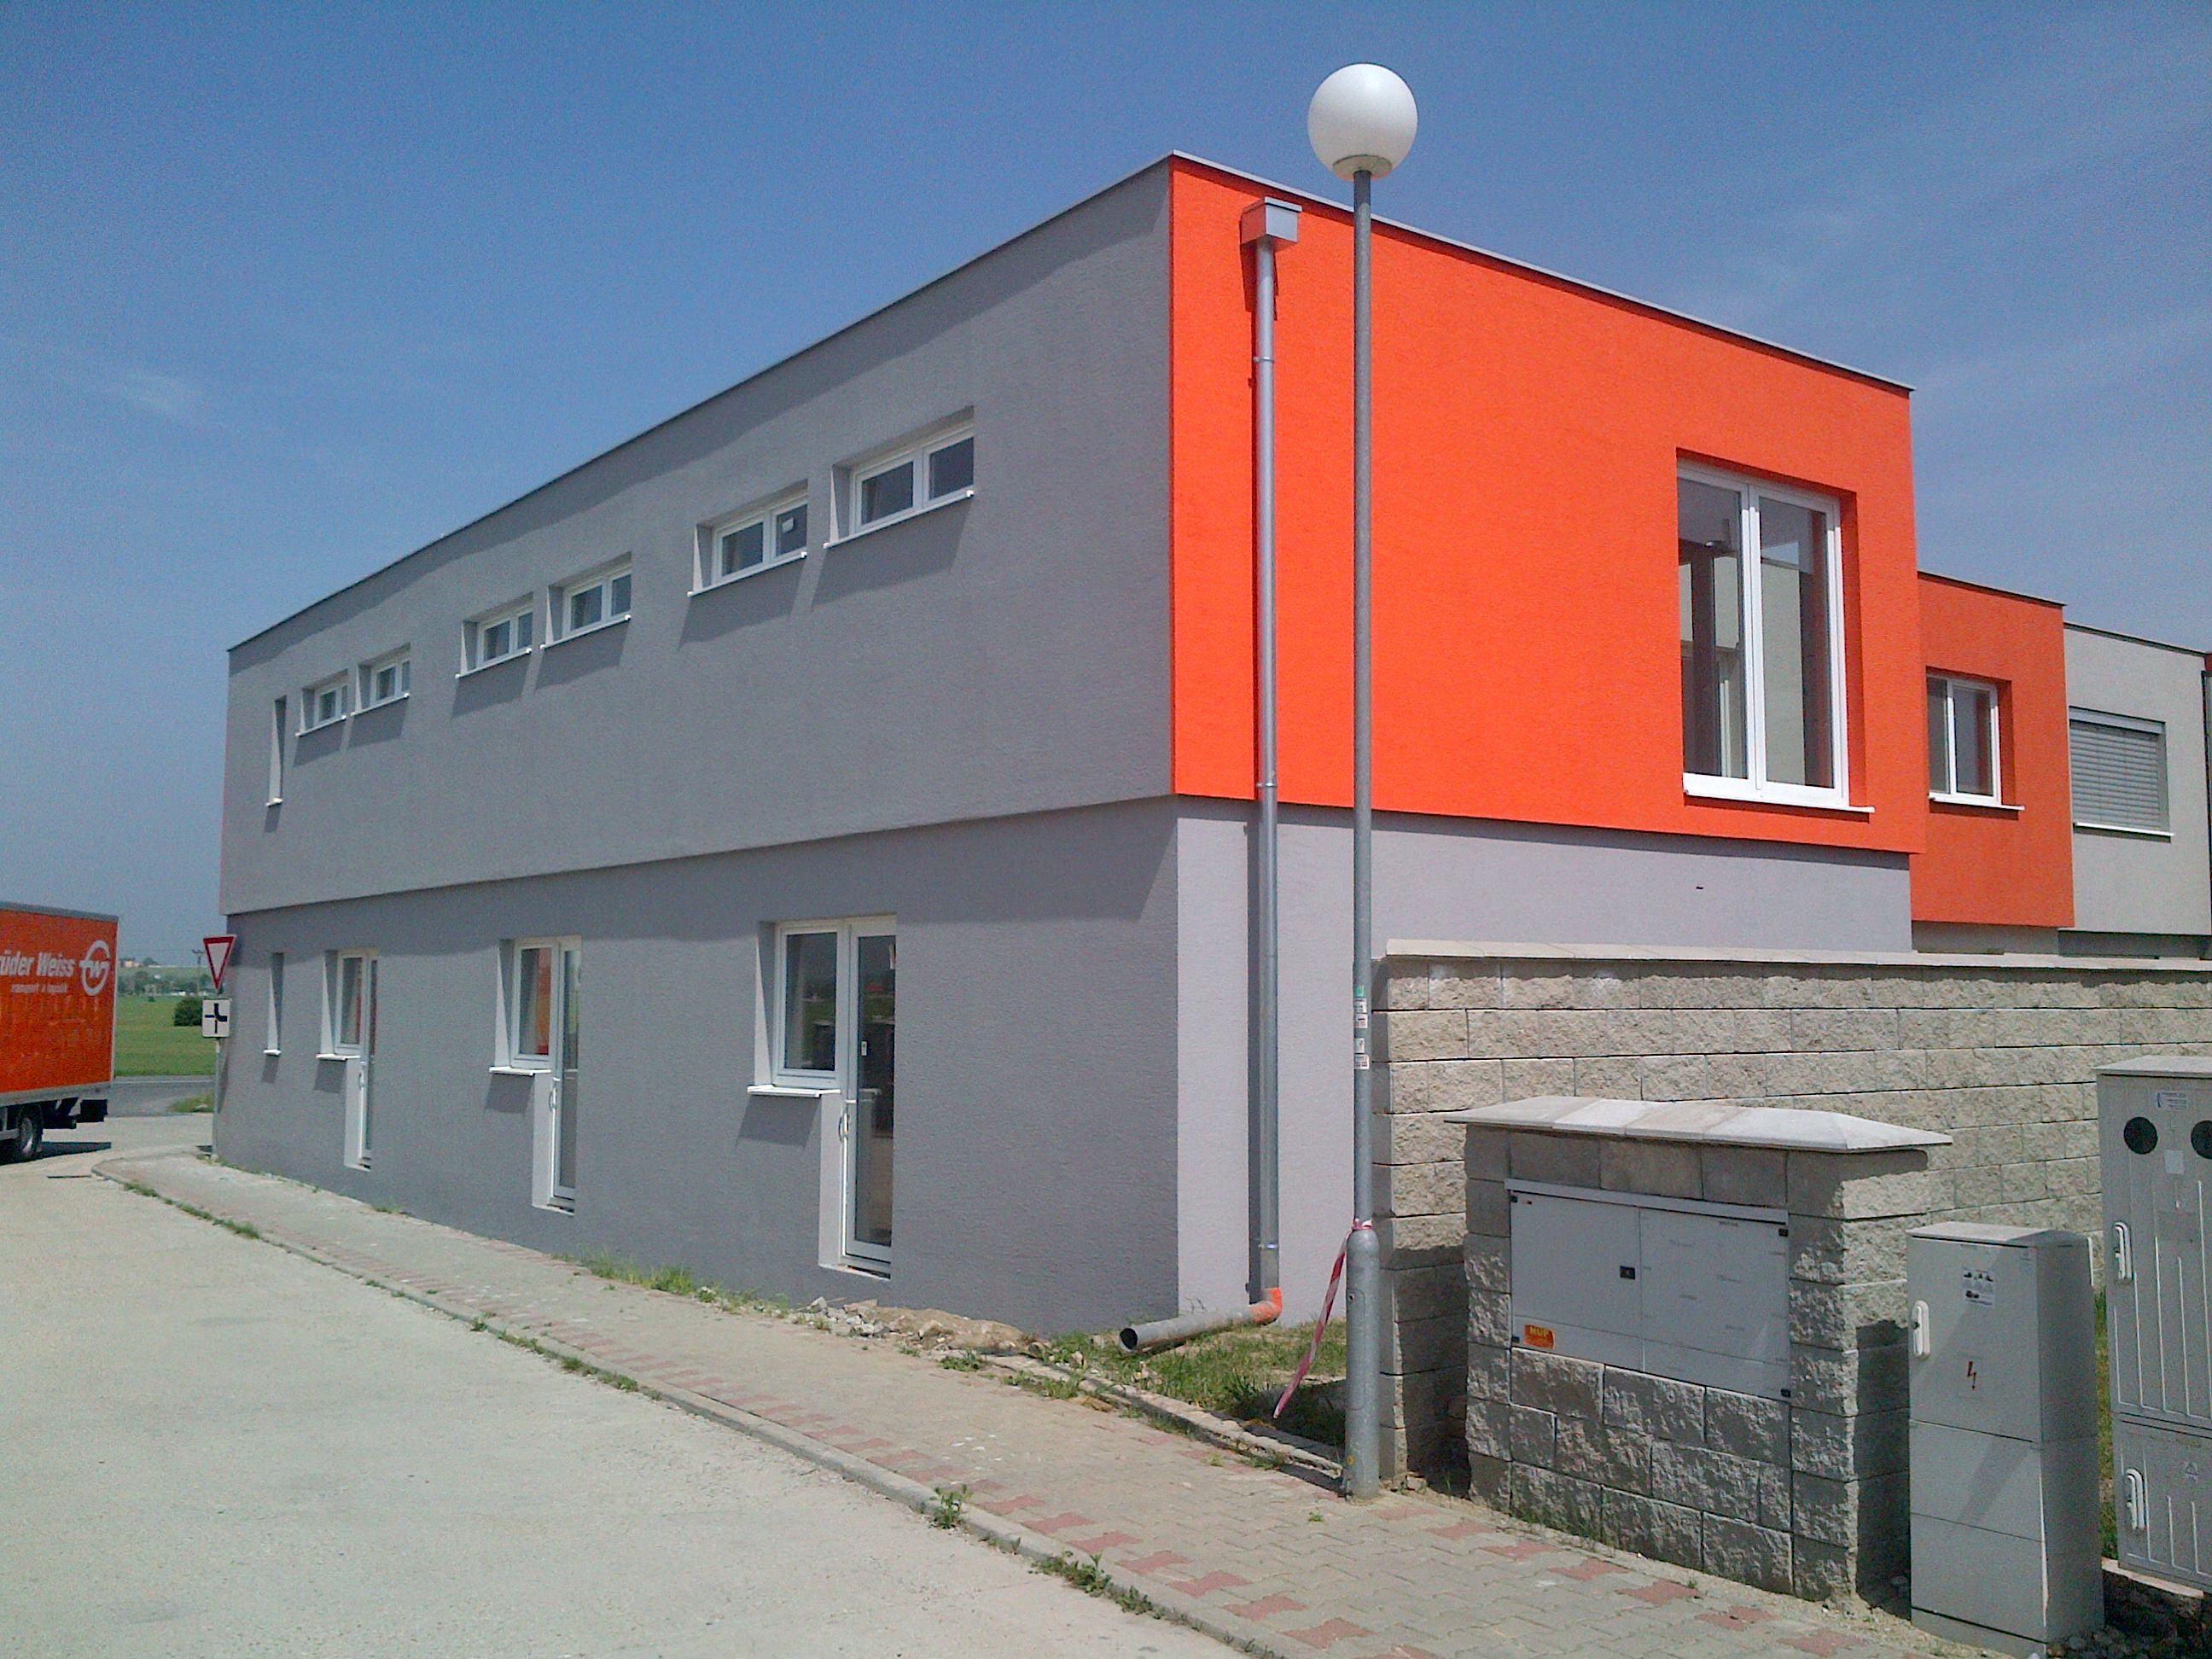 img-20130430-00300